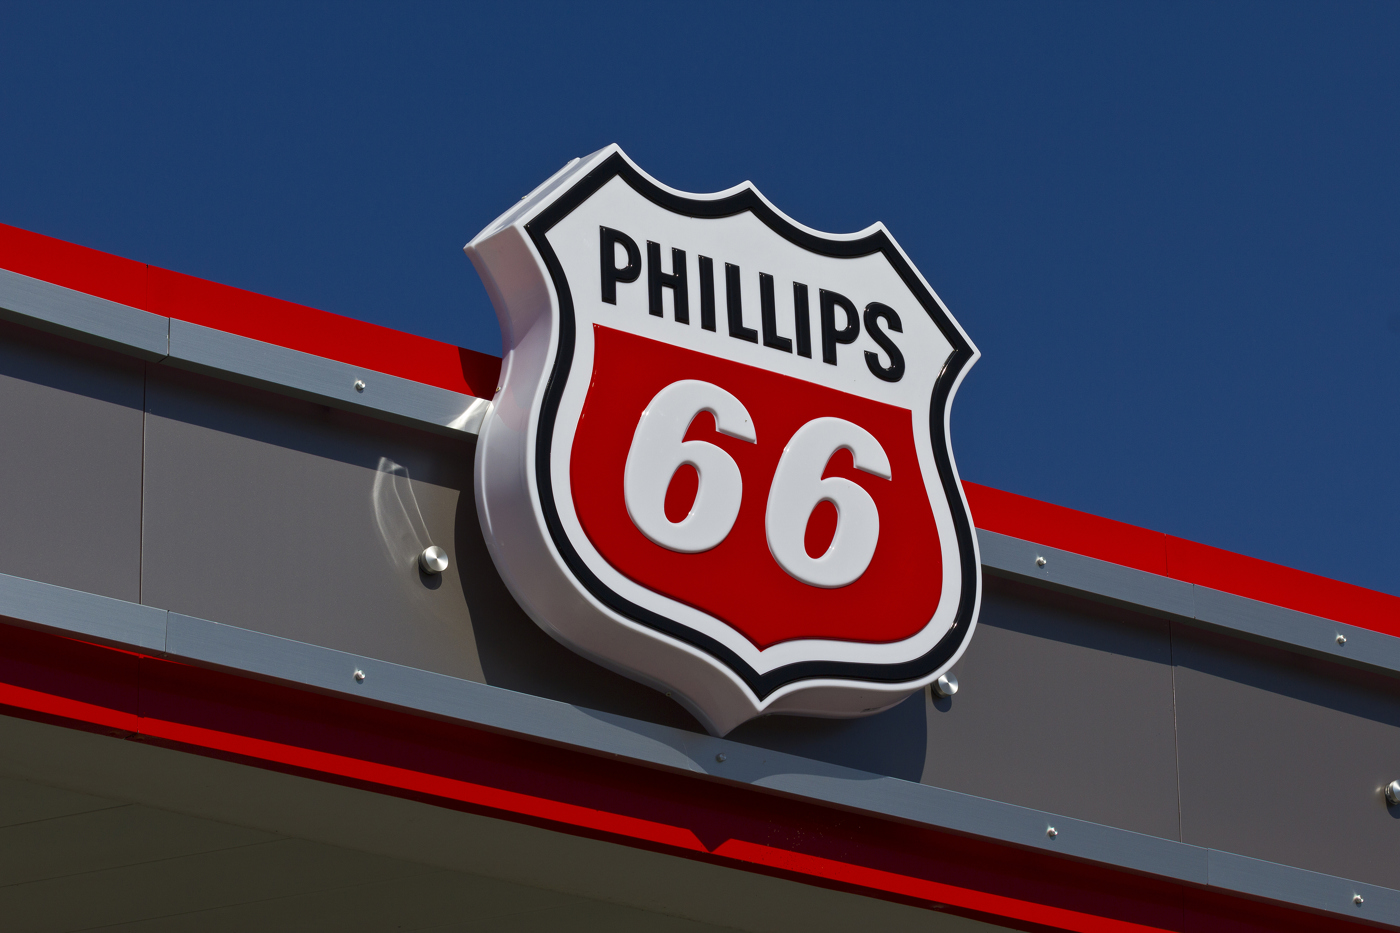 Phillips 66 stock, PSX stocks, gasoline and oil stocks